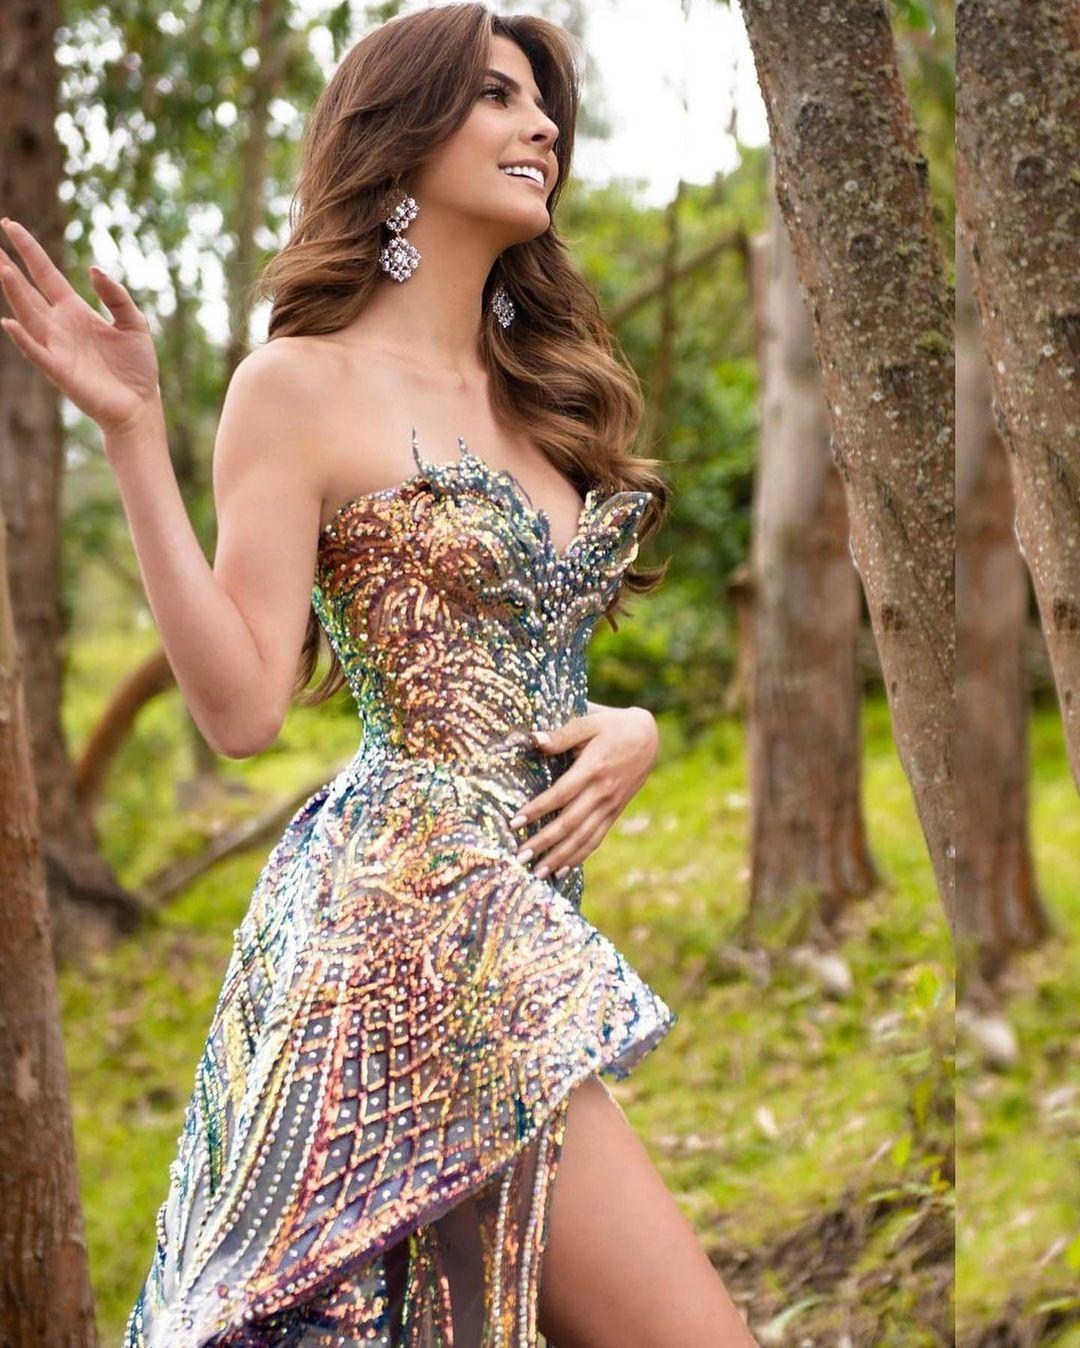 natalia manrique, miss grand colombia 2020. - Página 15 16401710